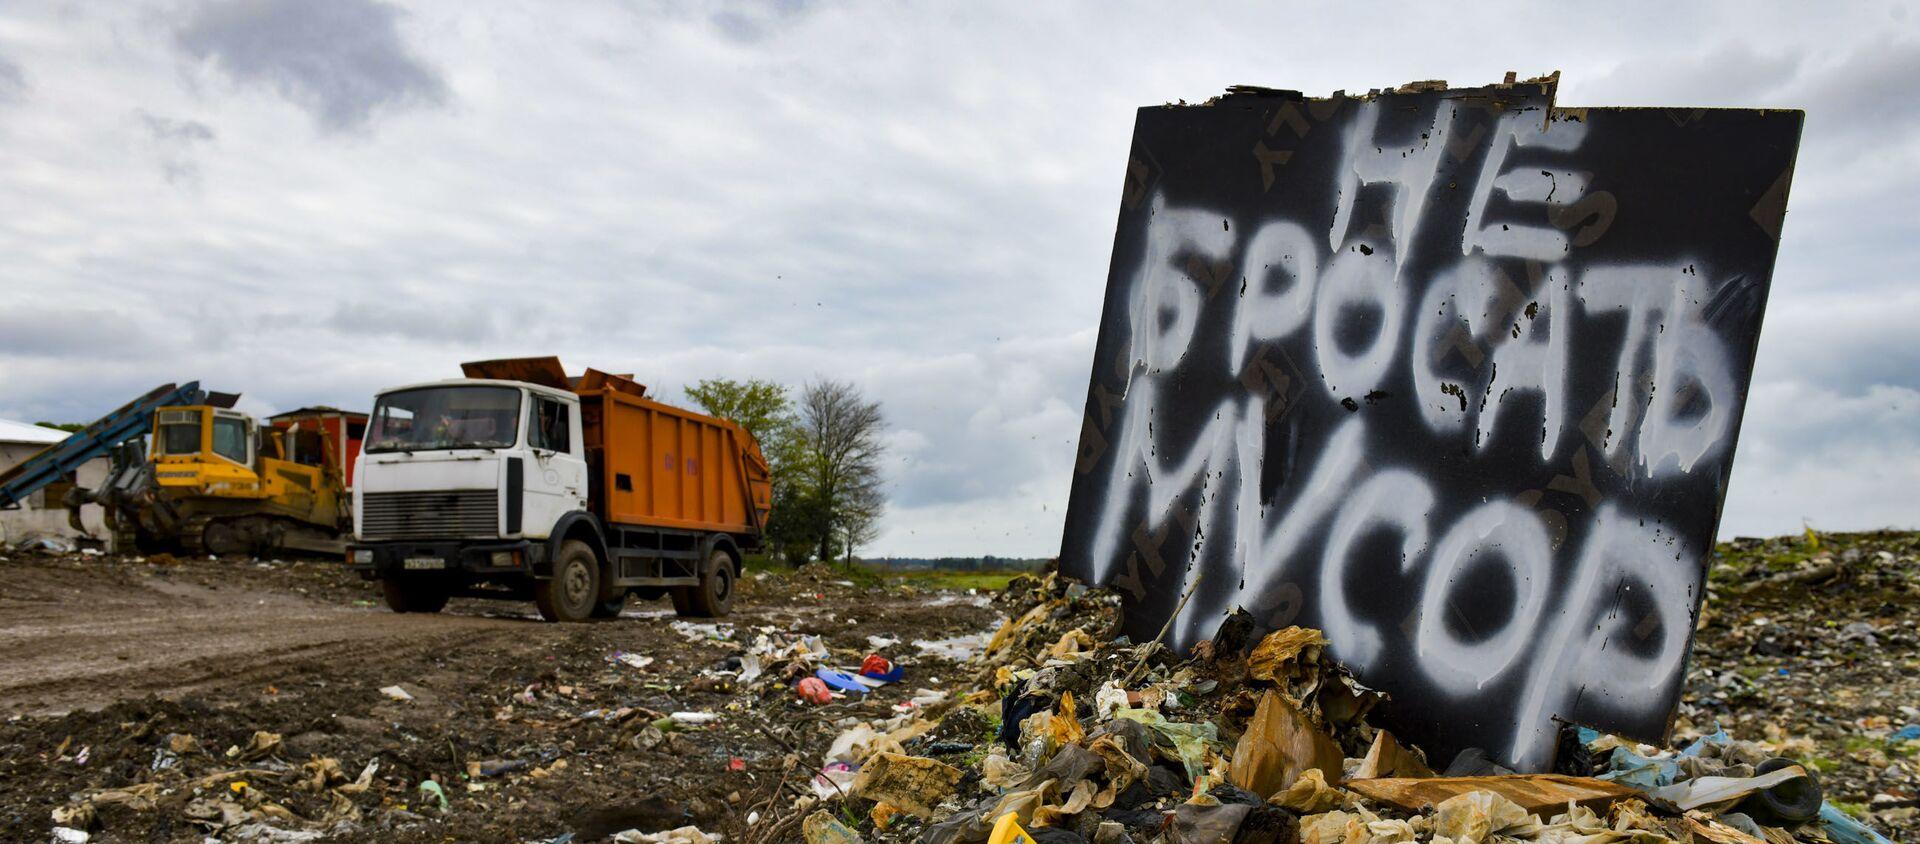 Гагрская городская мусорная свалка - Sputnik Абхазия, 1920, 30.04.2021